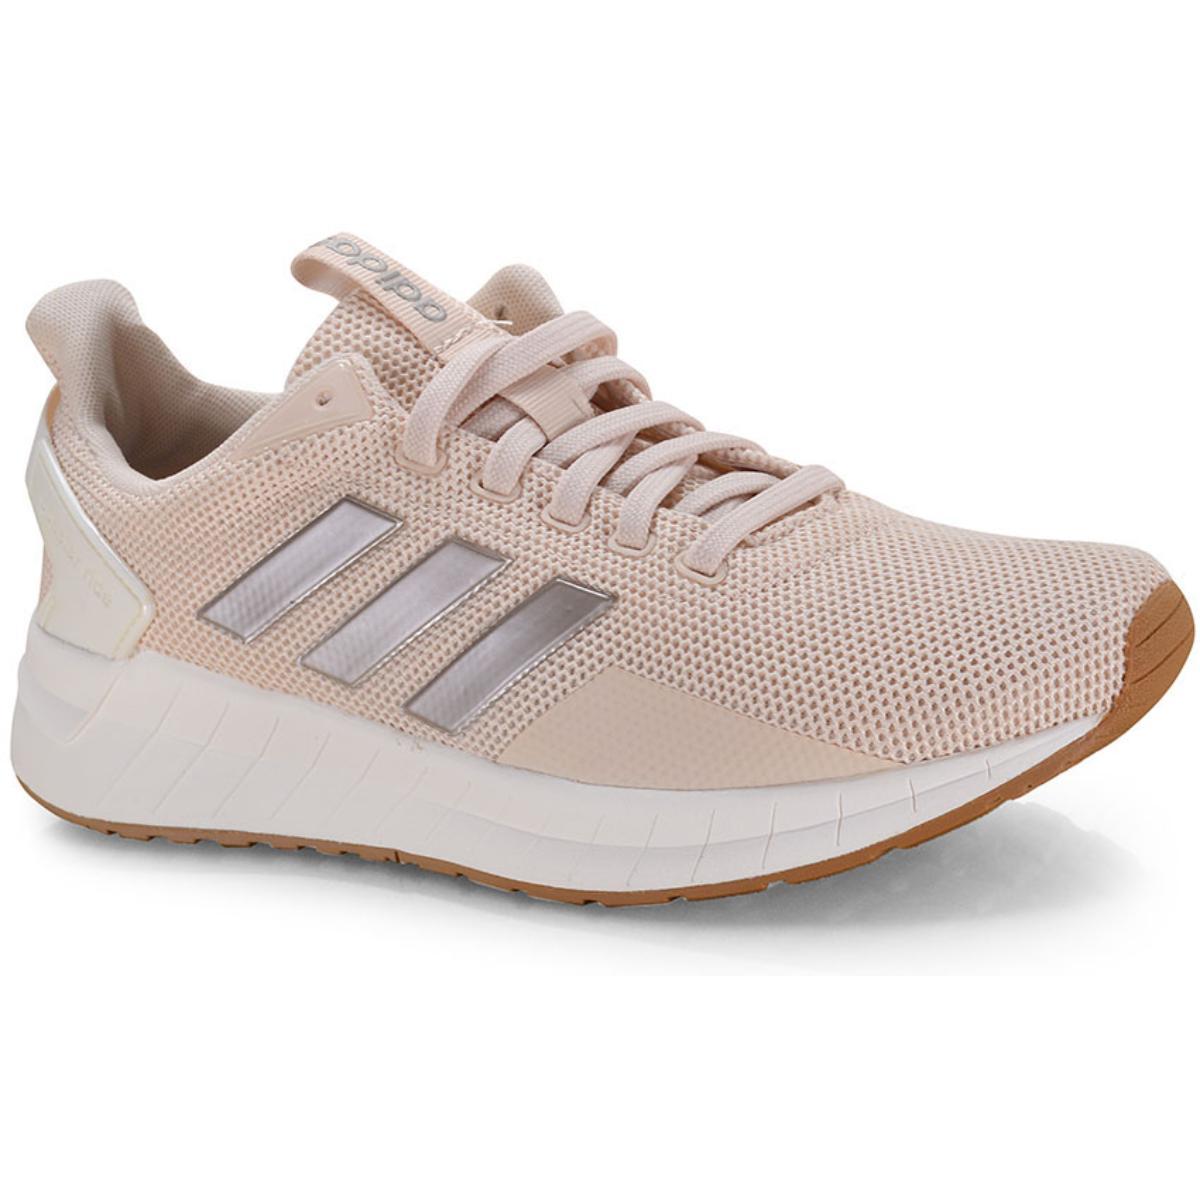 Tênis Feminino Adidas Ee8375 Questar Ride Pêssego Claro